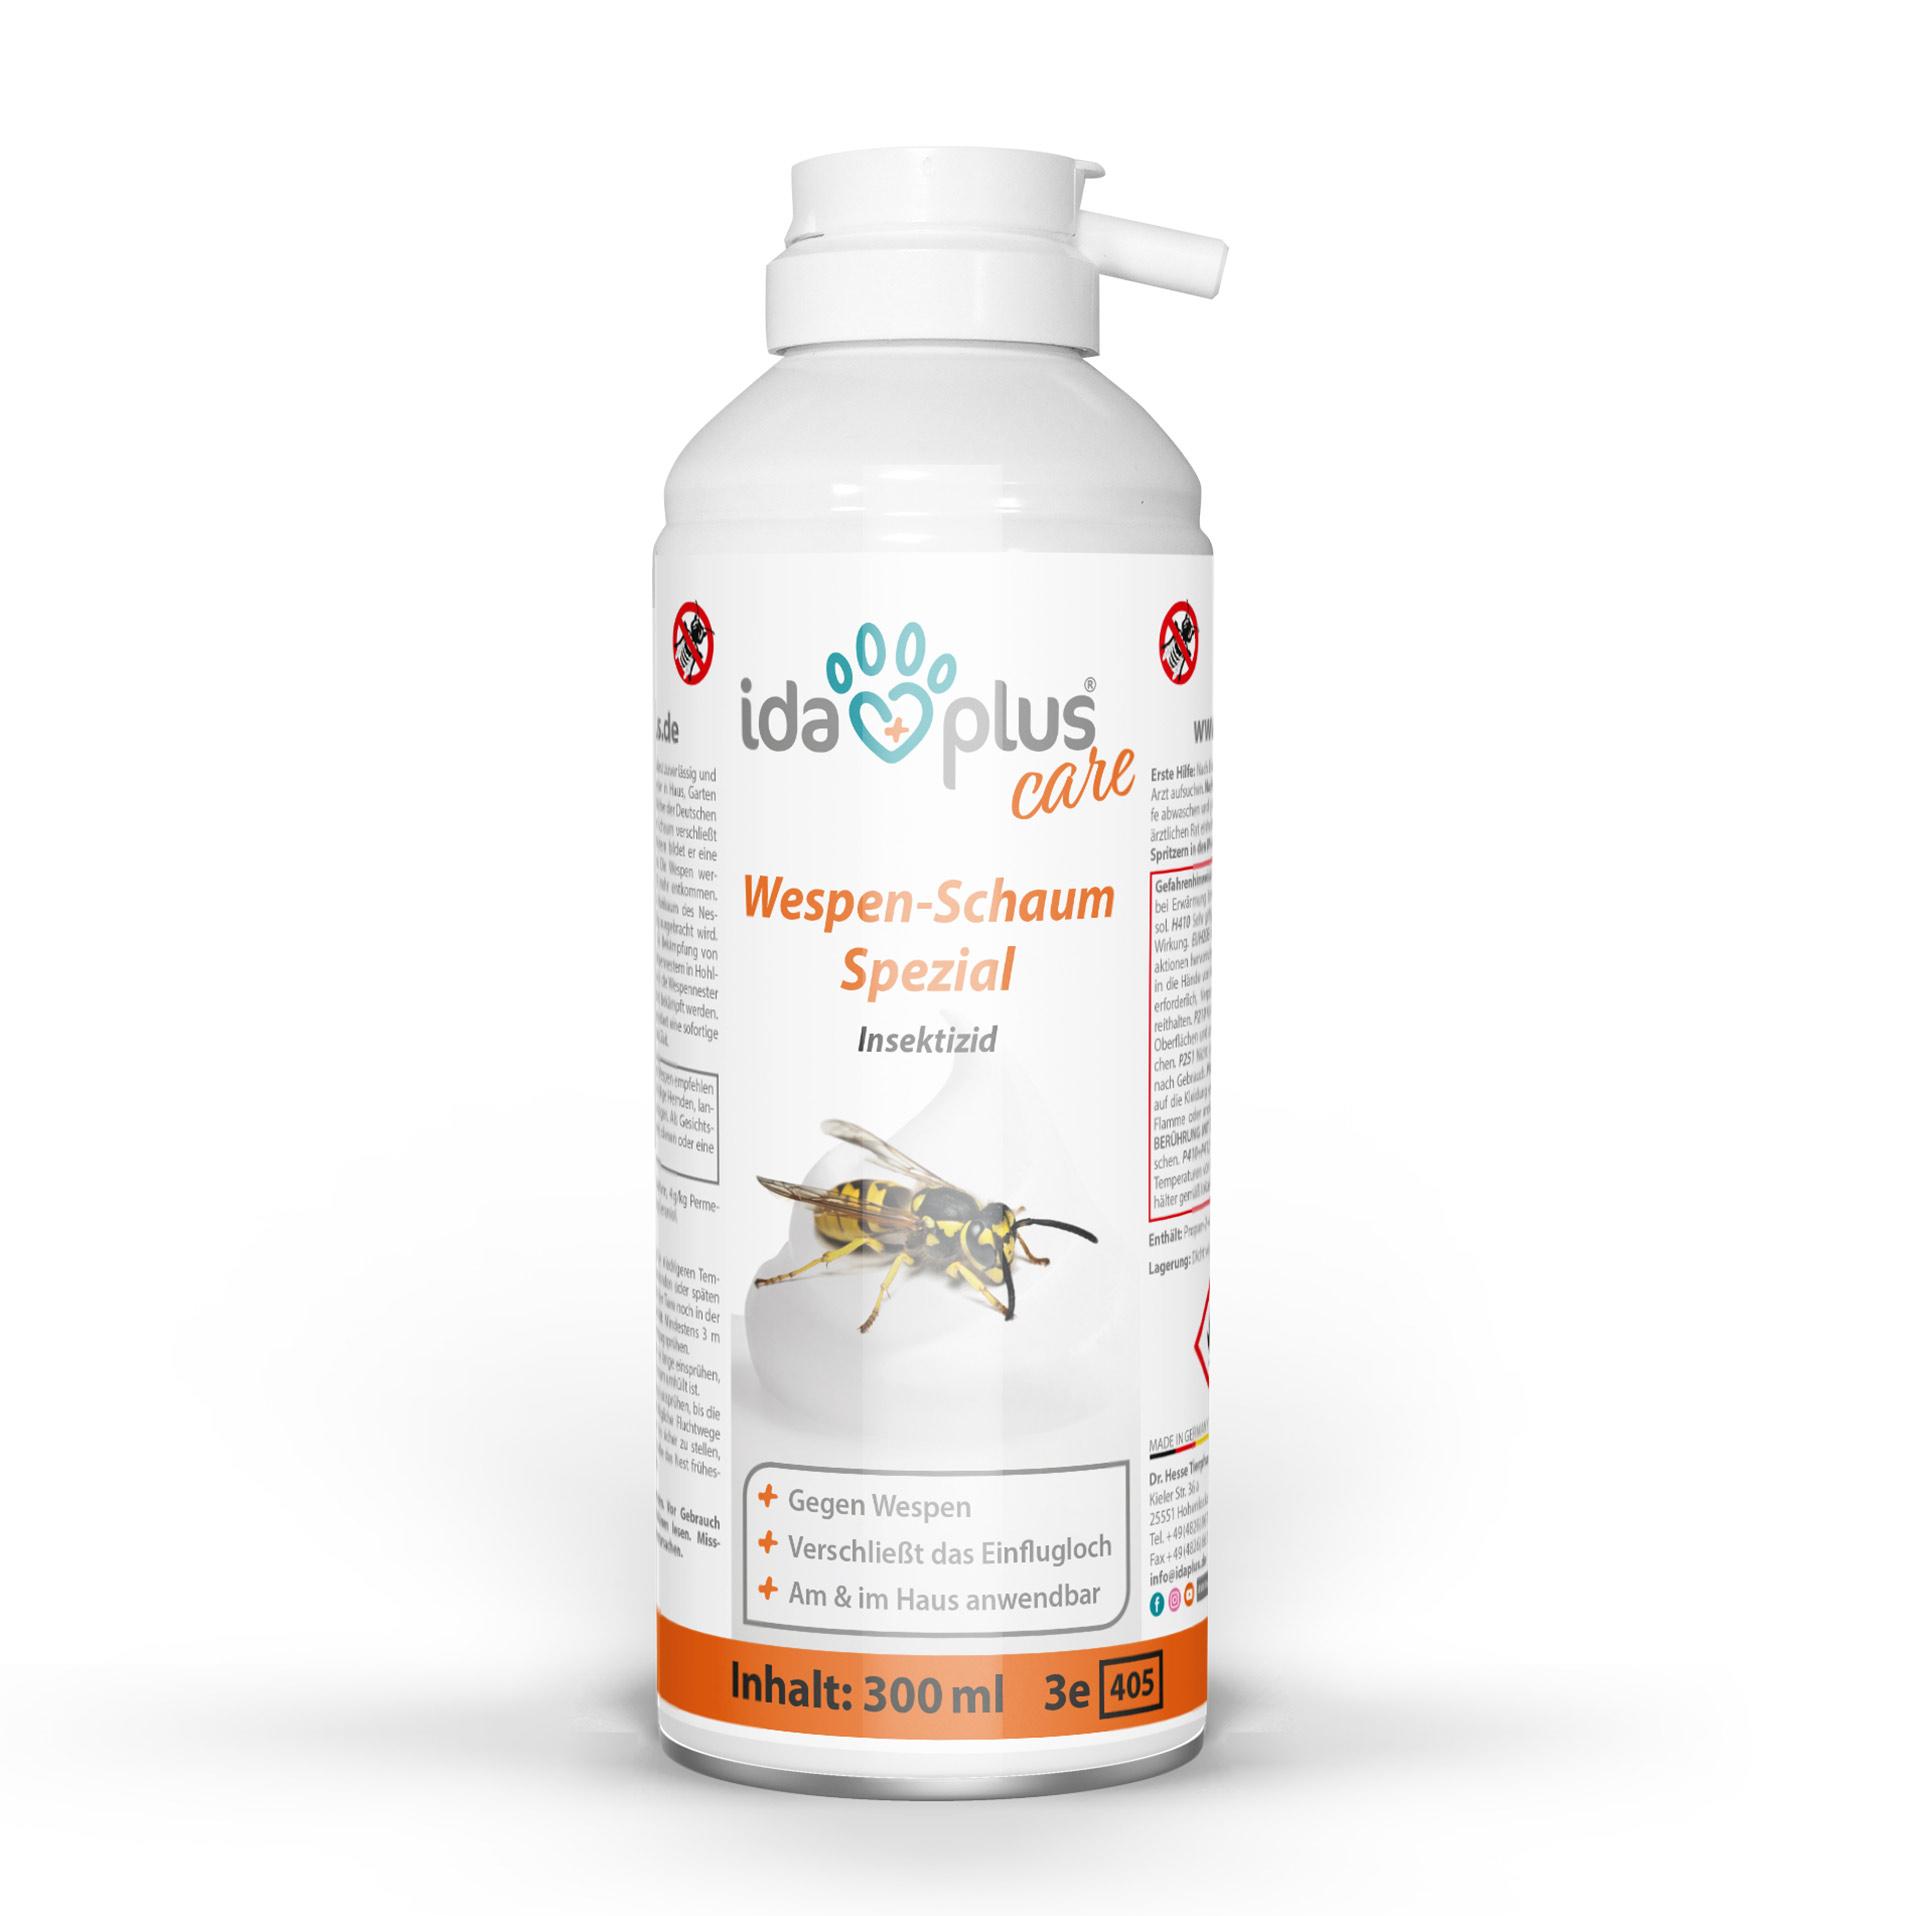 Wespenschaum – zuverlässiger Wespenschutz - verschließt das Einflugloch - 300 ml